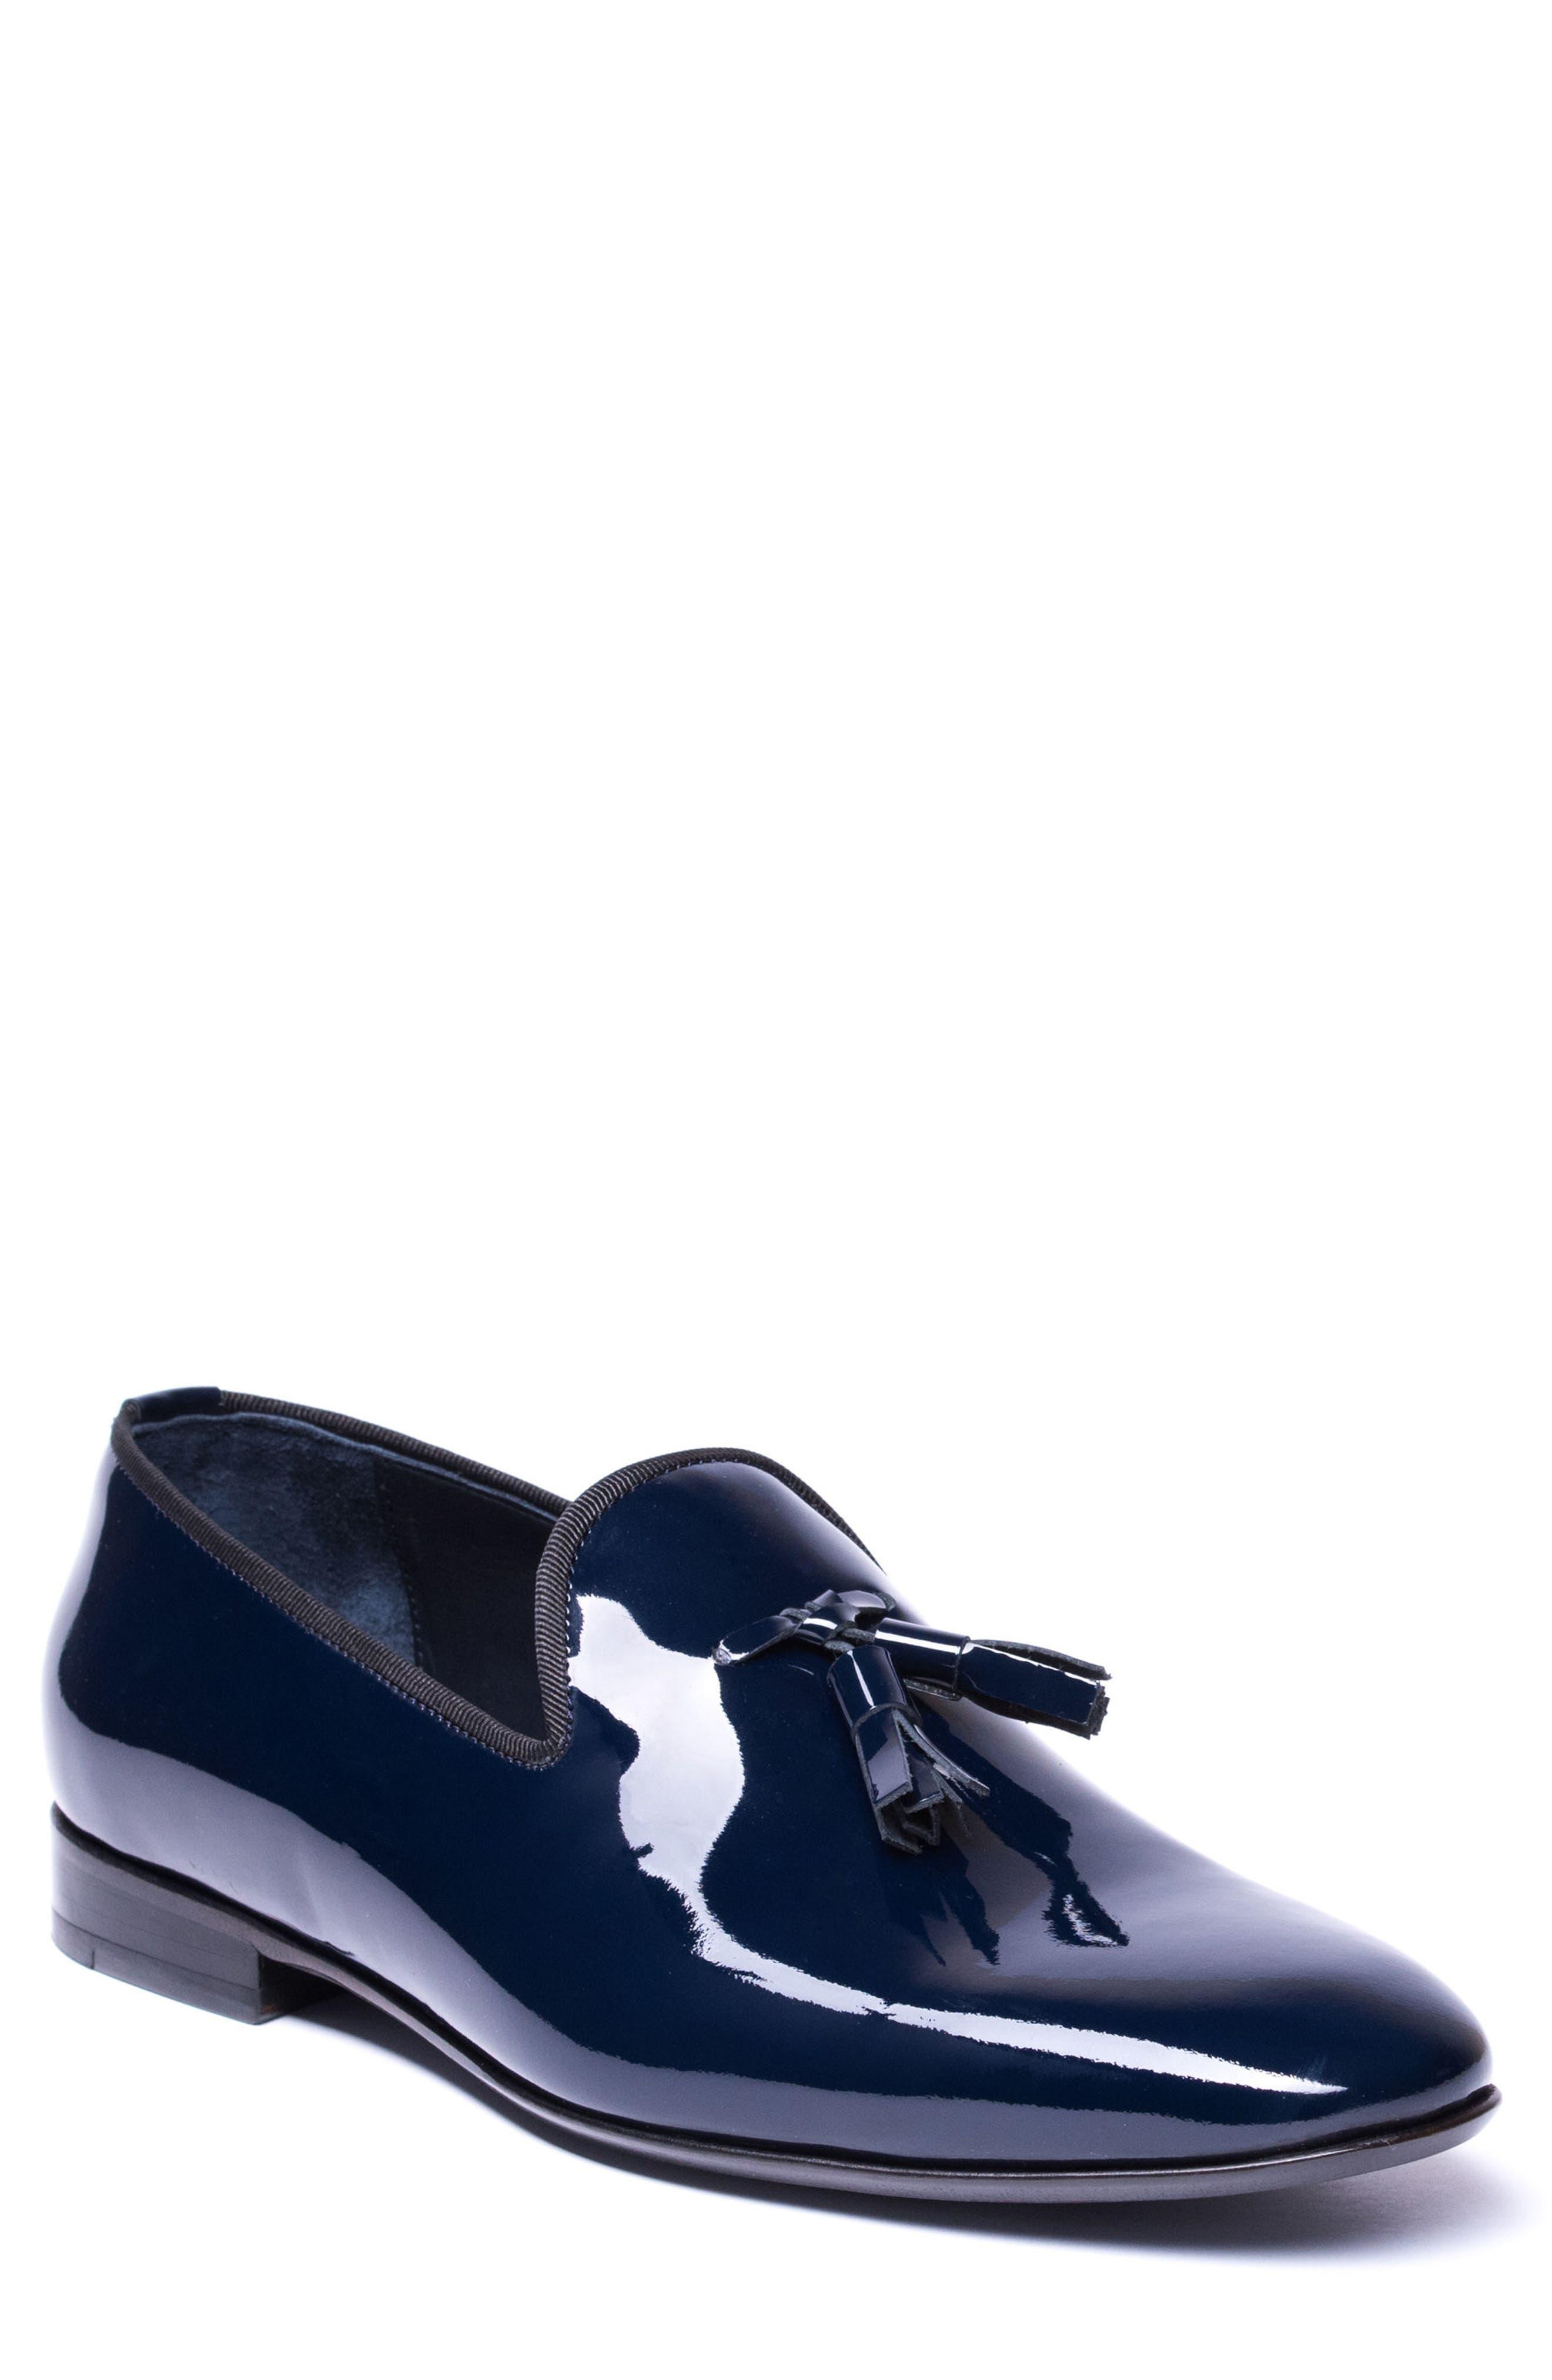 Enzo Tasseled Venetian Loafer,                         Main,                         color, Navy Leather